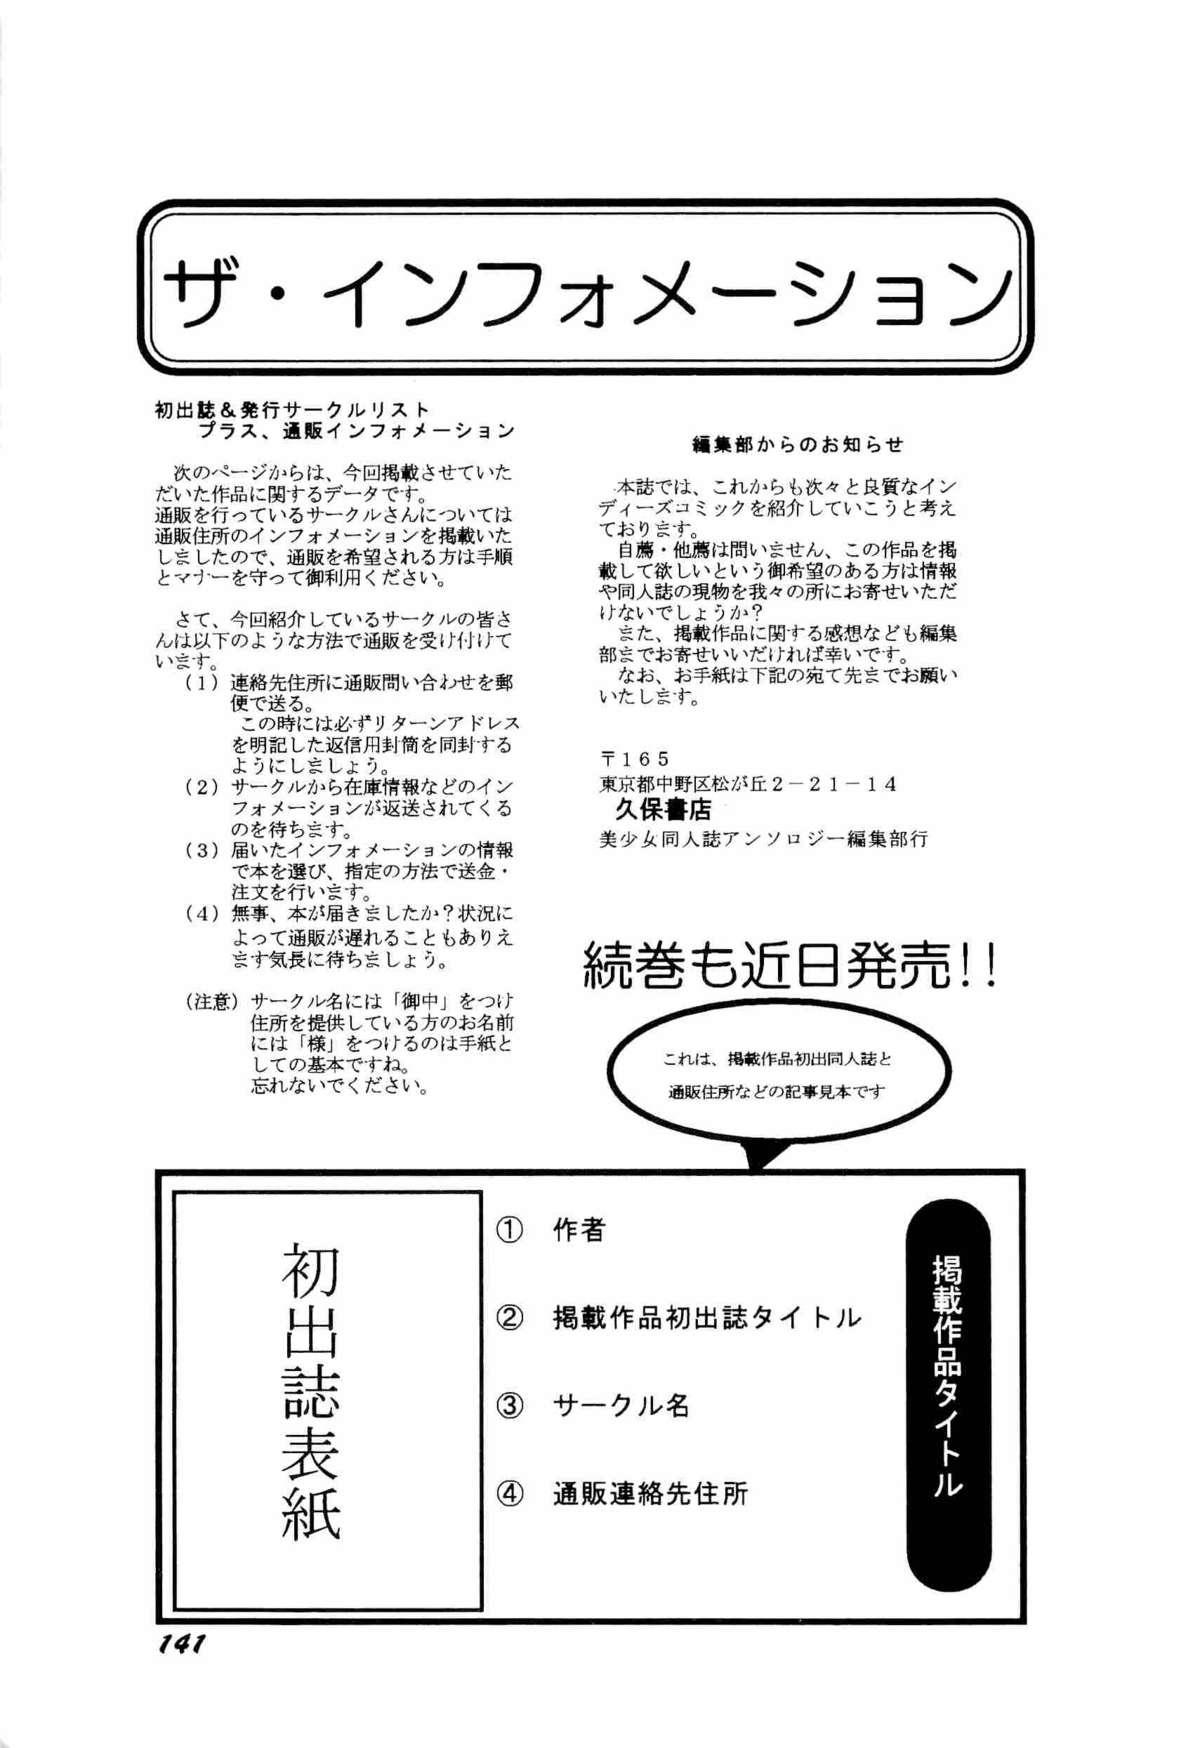 Bisyoujo Anthology '93 jyoukan 143